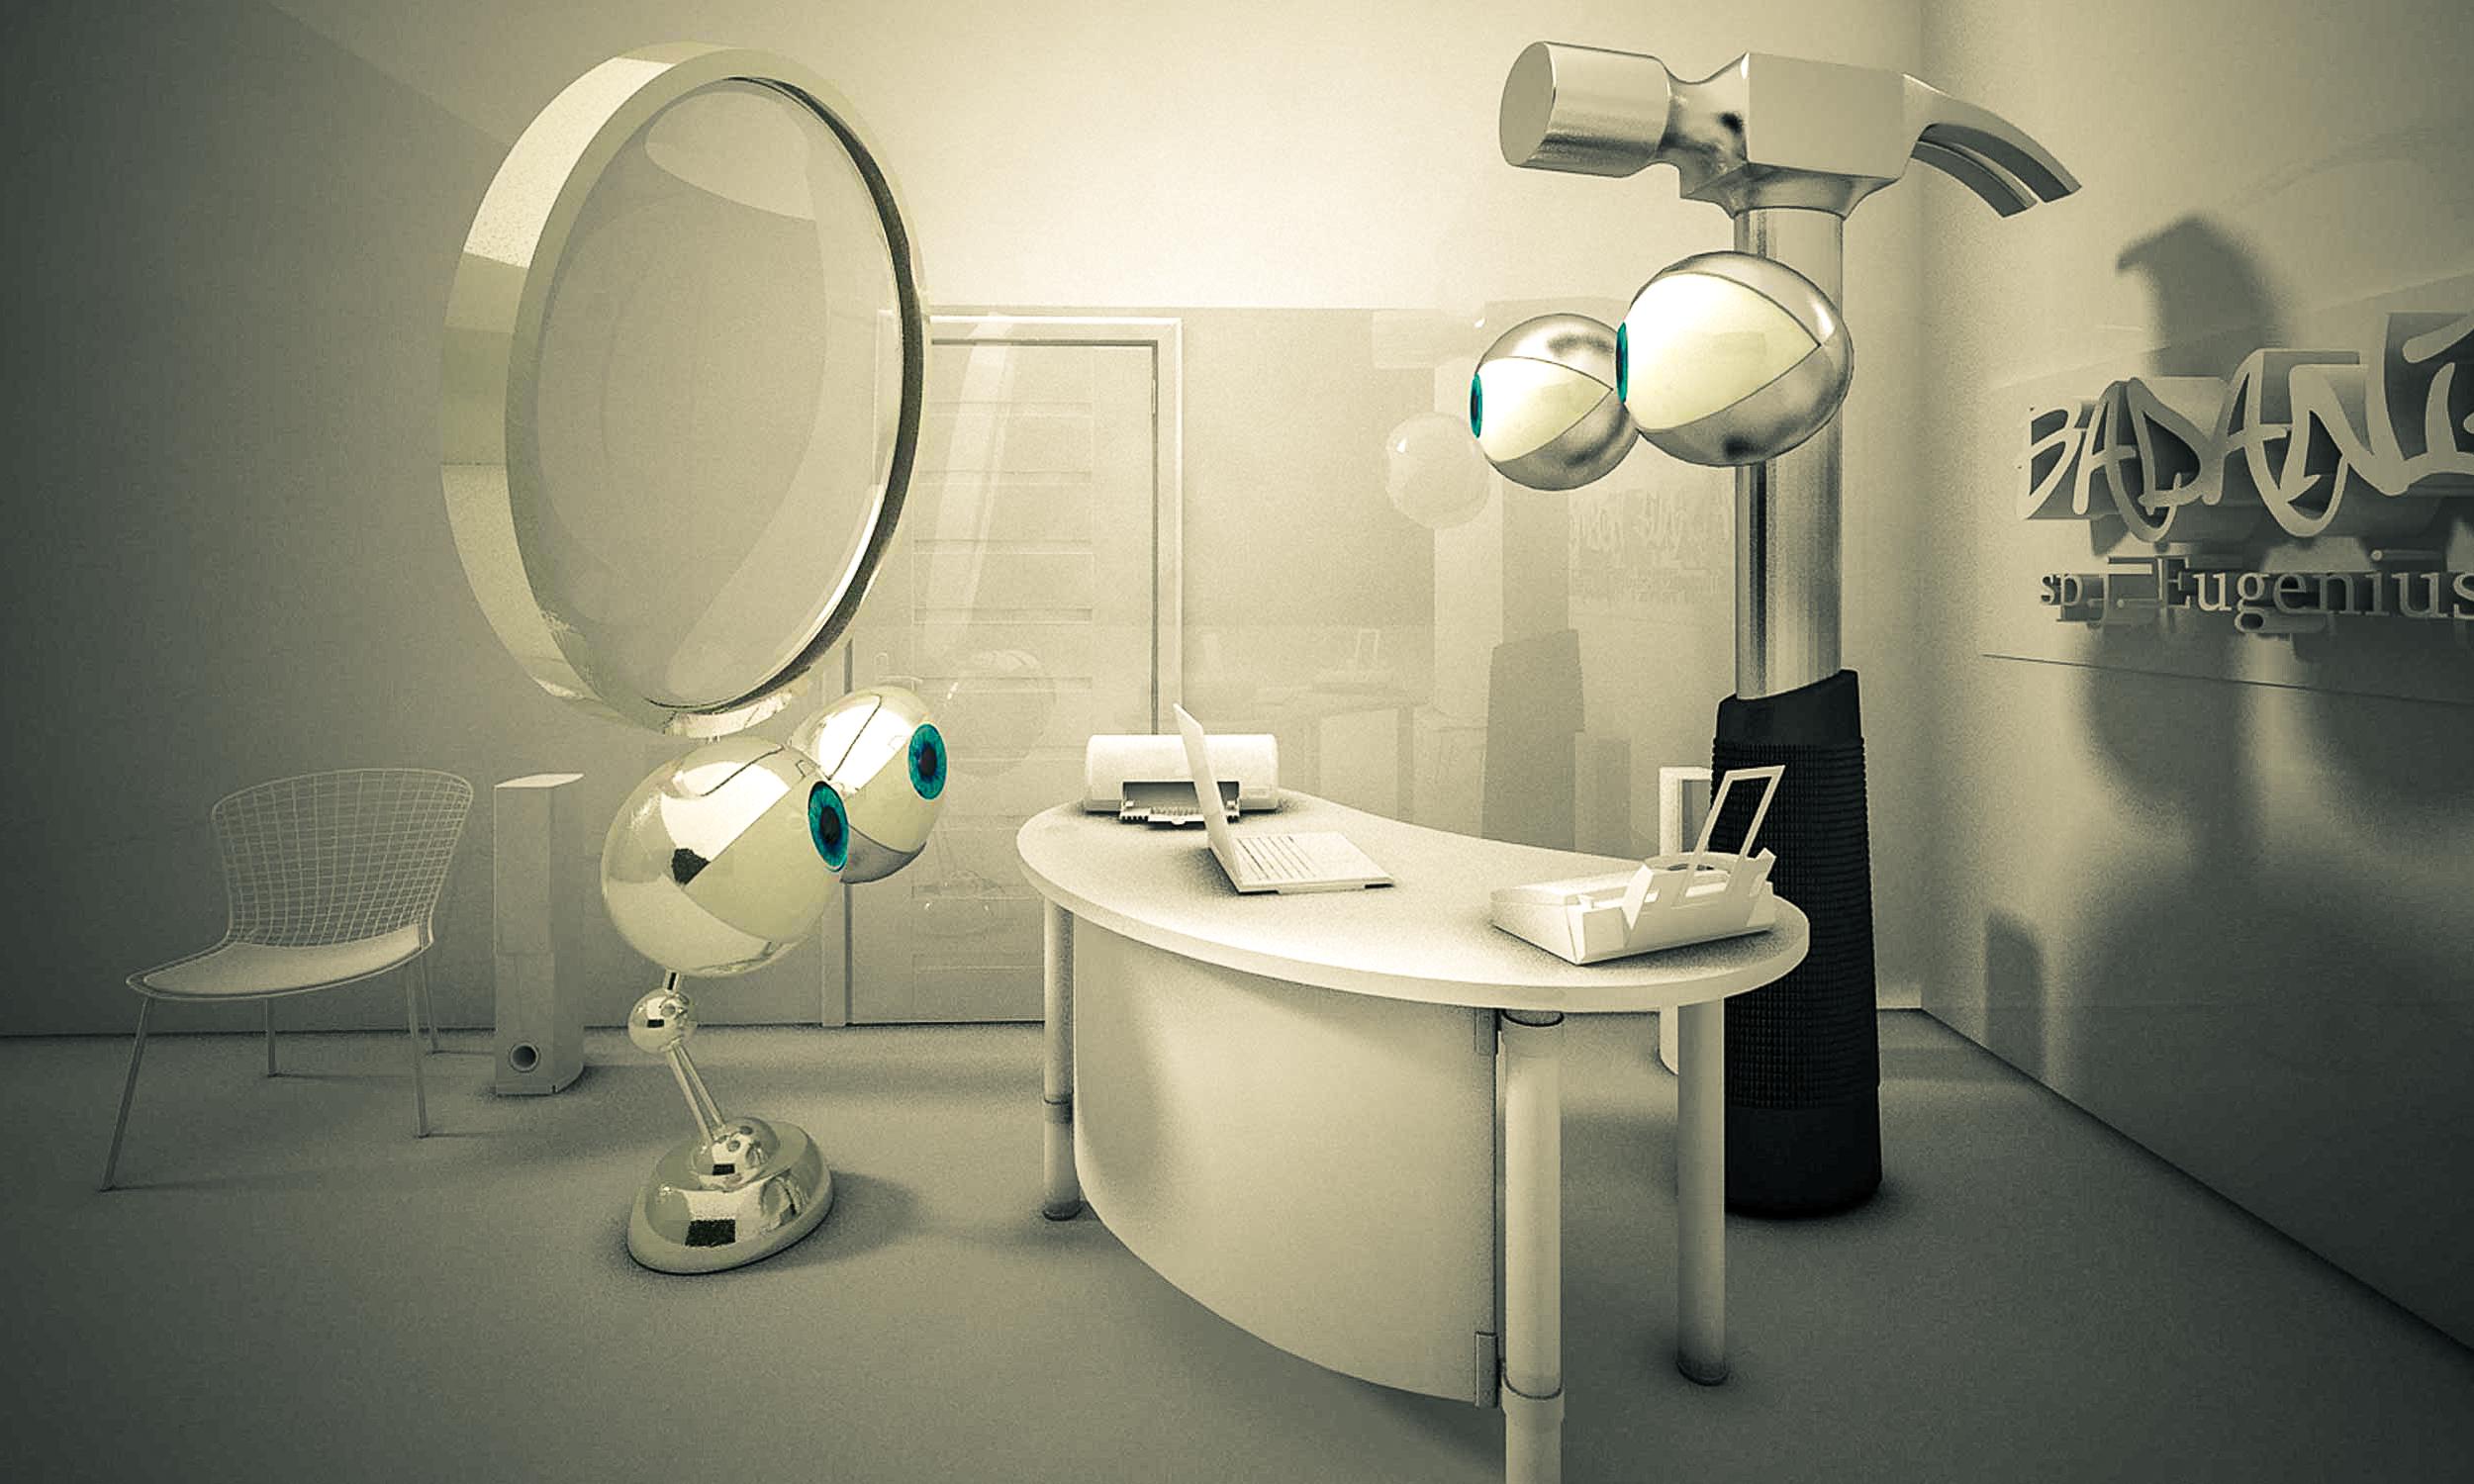 artur-klamut-rendering-ligtroom-presets-1